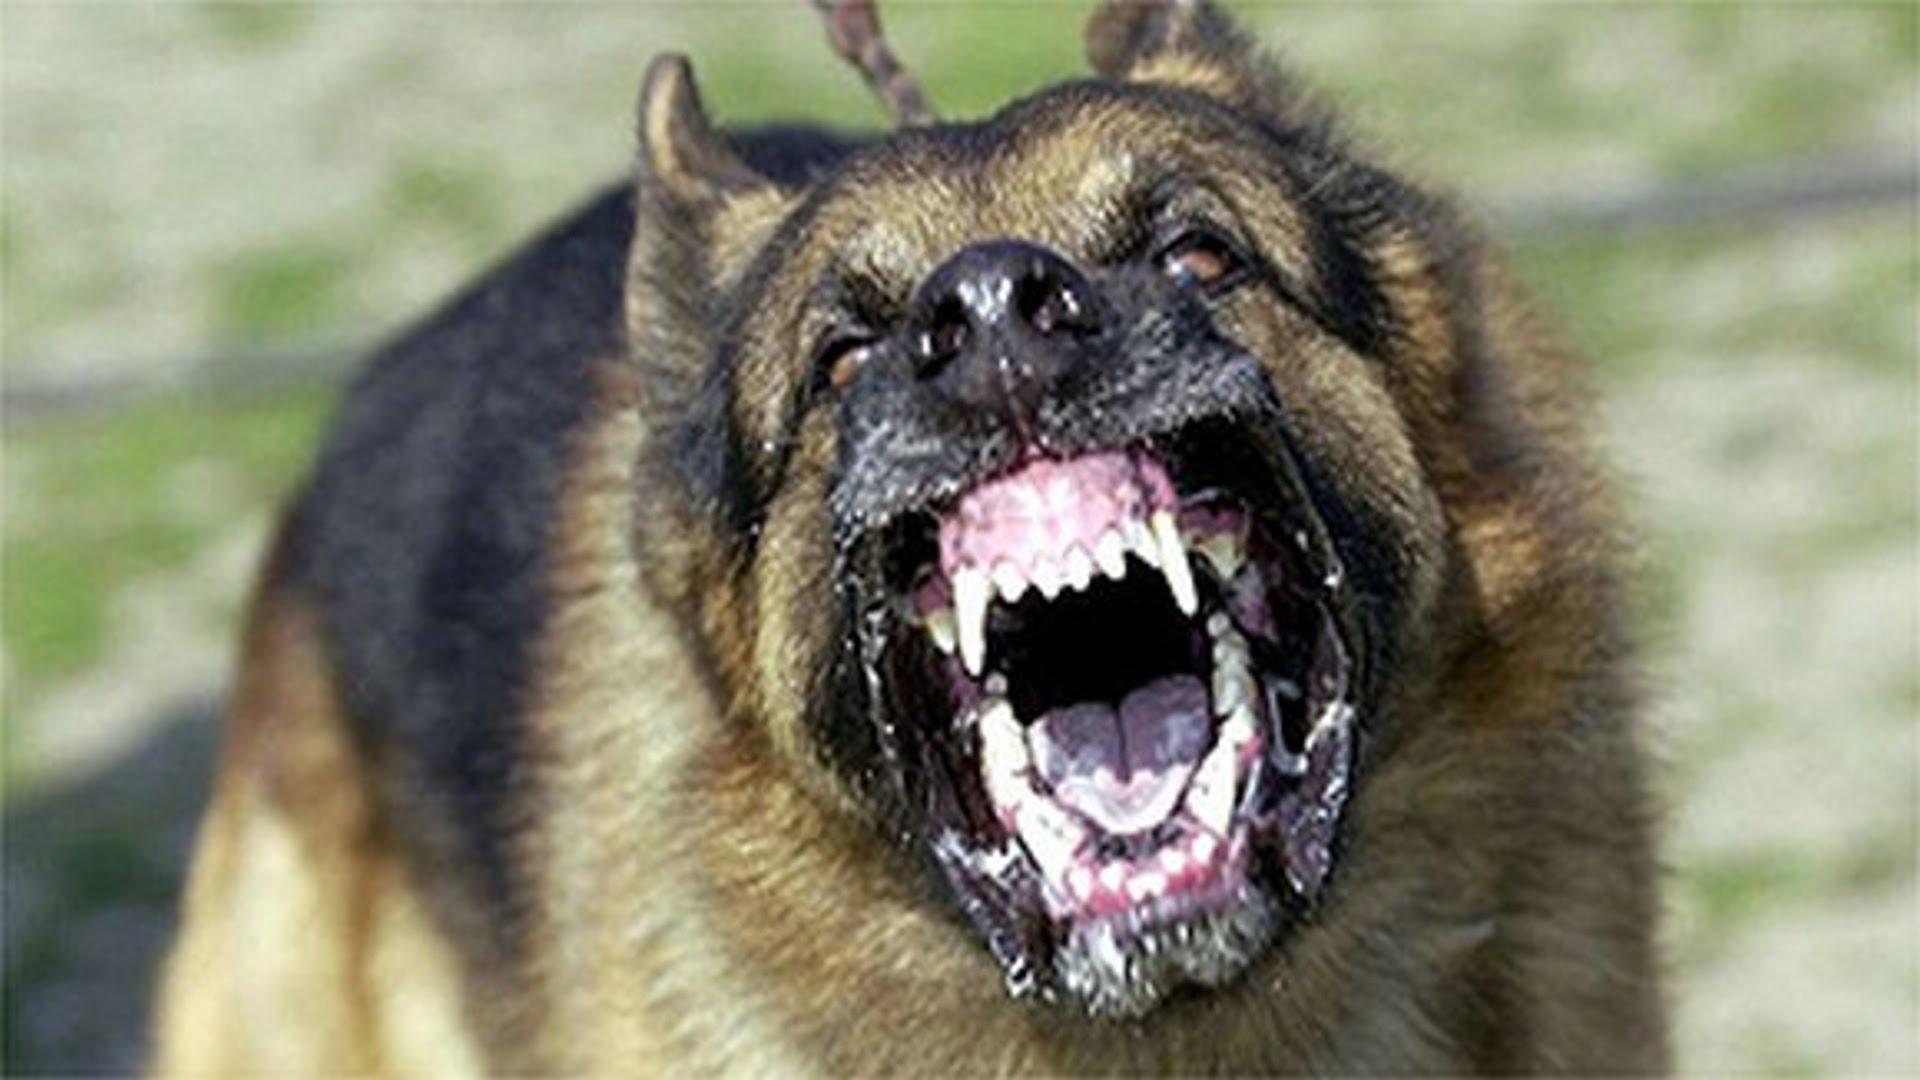 cattle mutilation aggressive dog